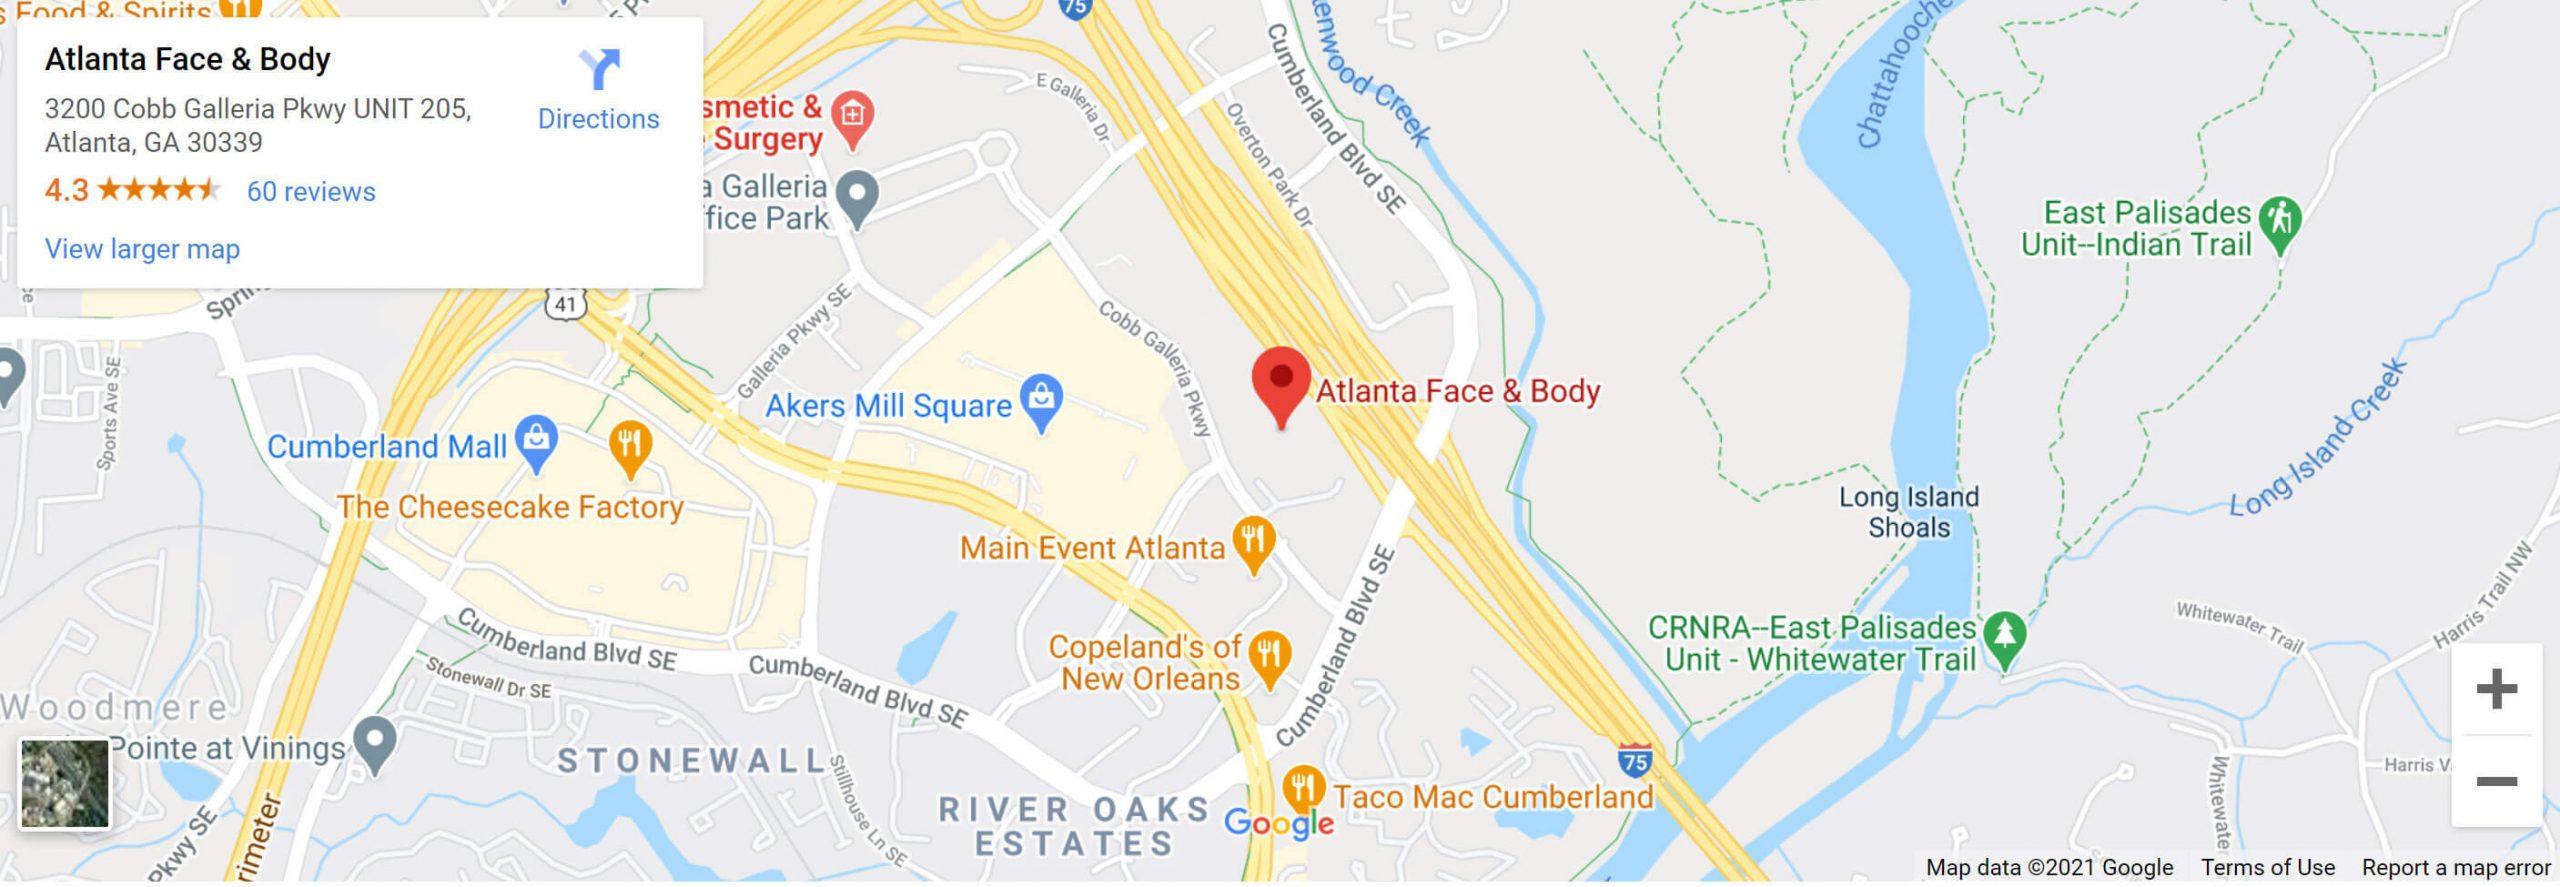 Atlanta Face& Body Map